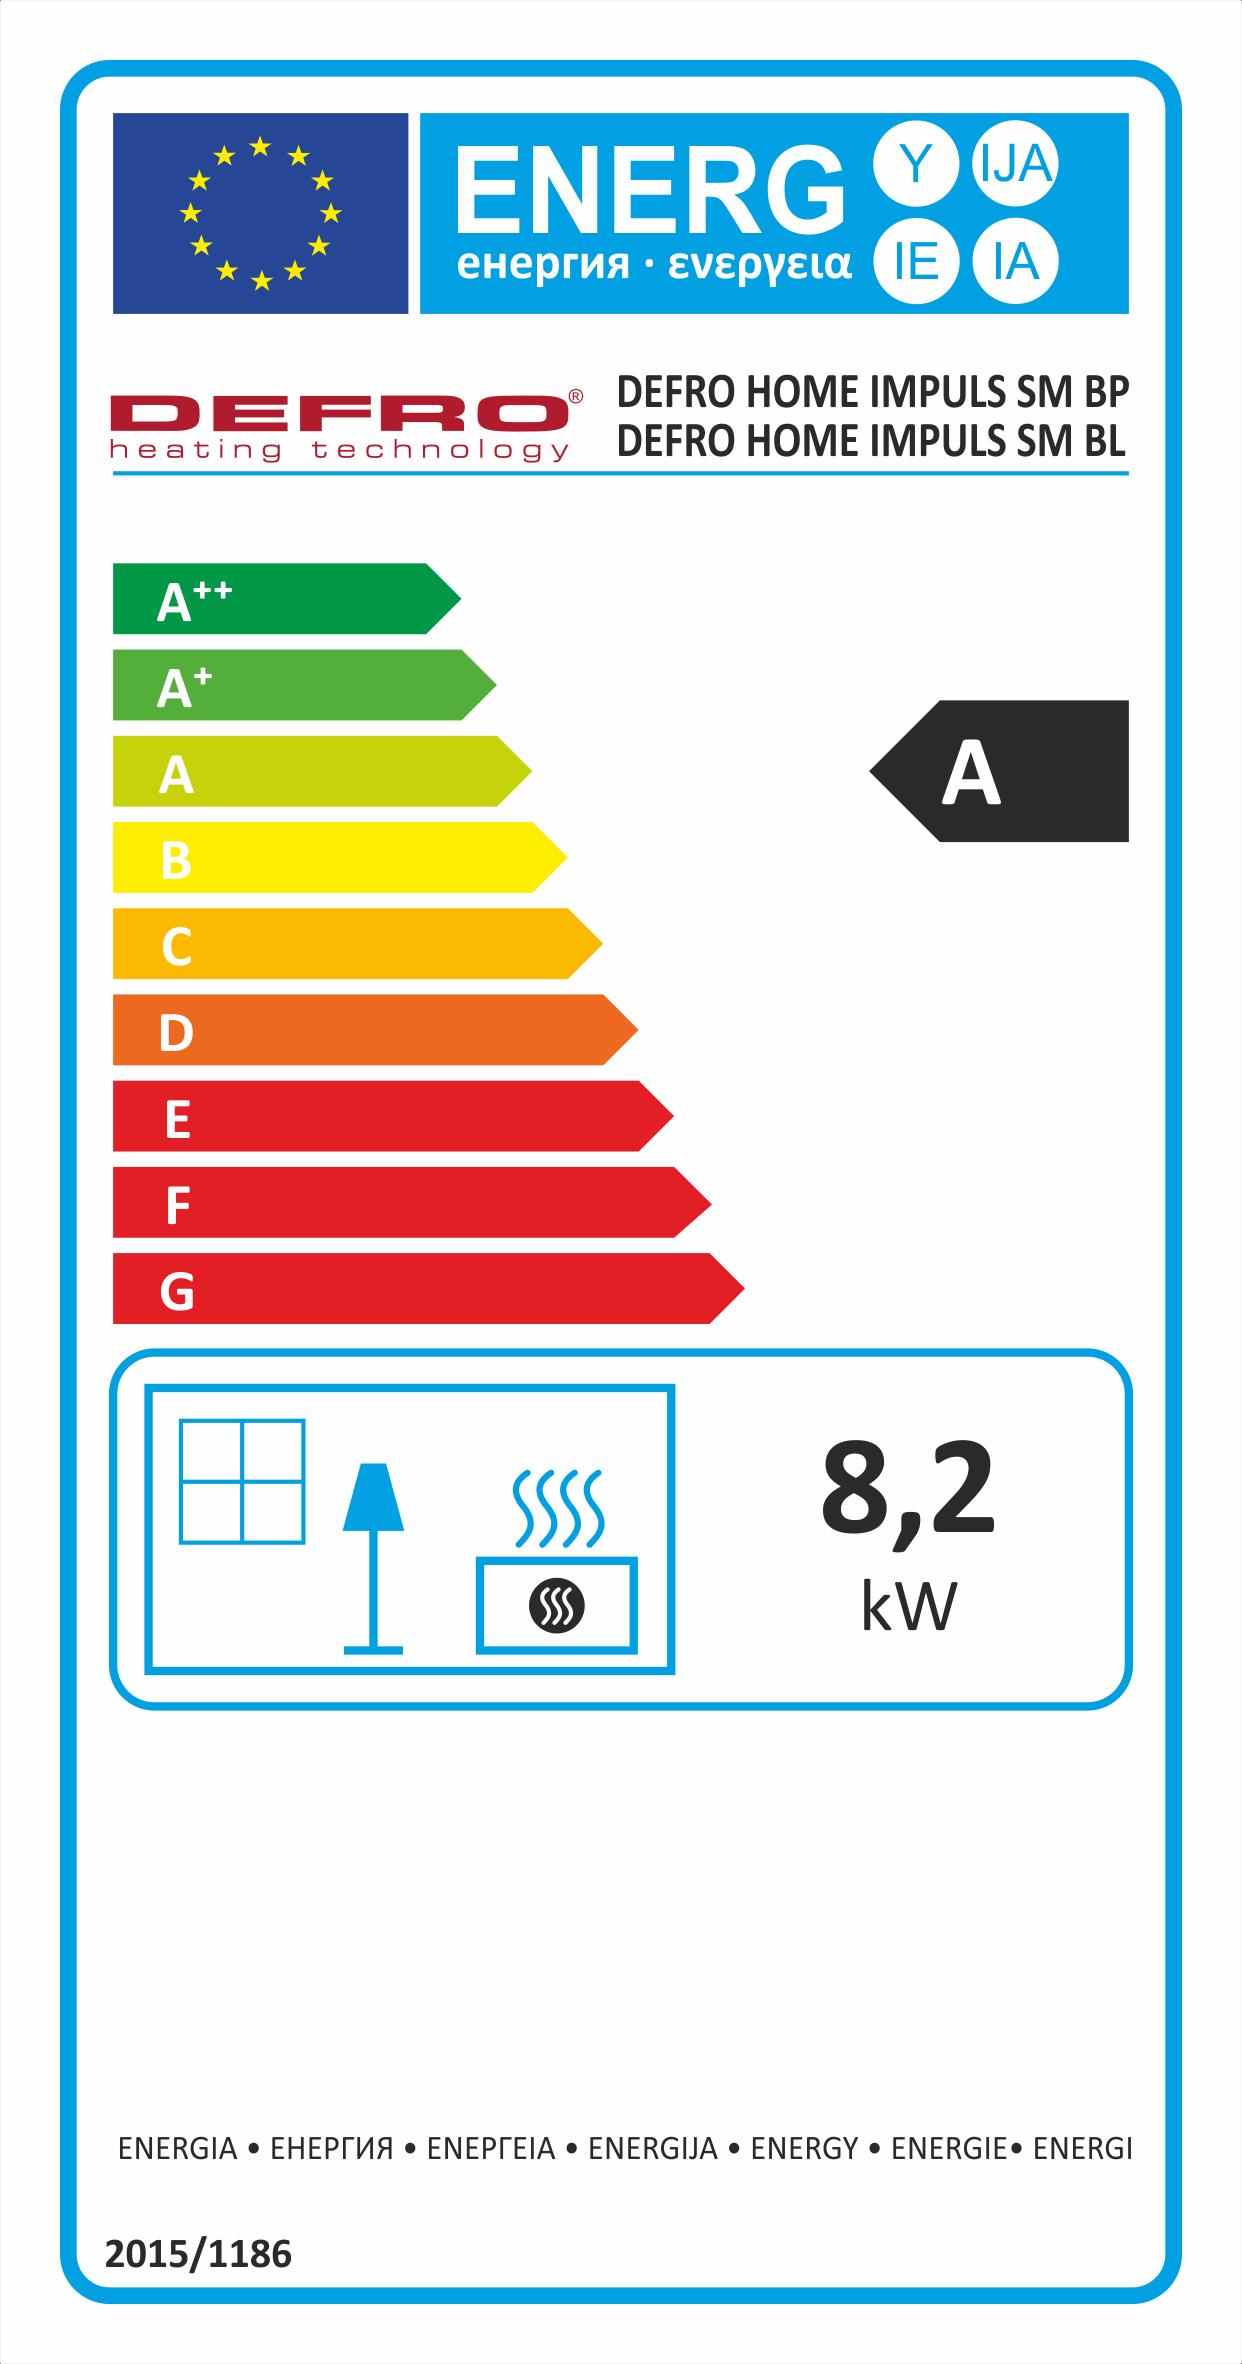 Defro Home Impuls SM BP energeticky stitok krbyonline